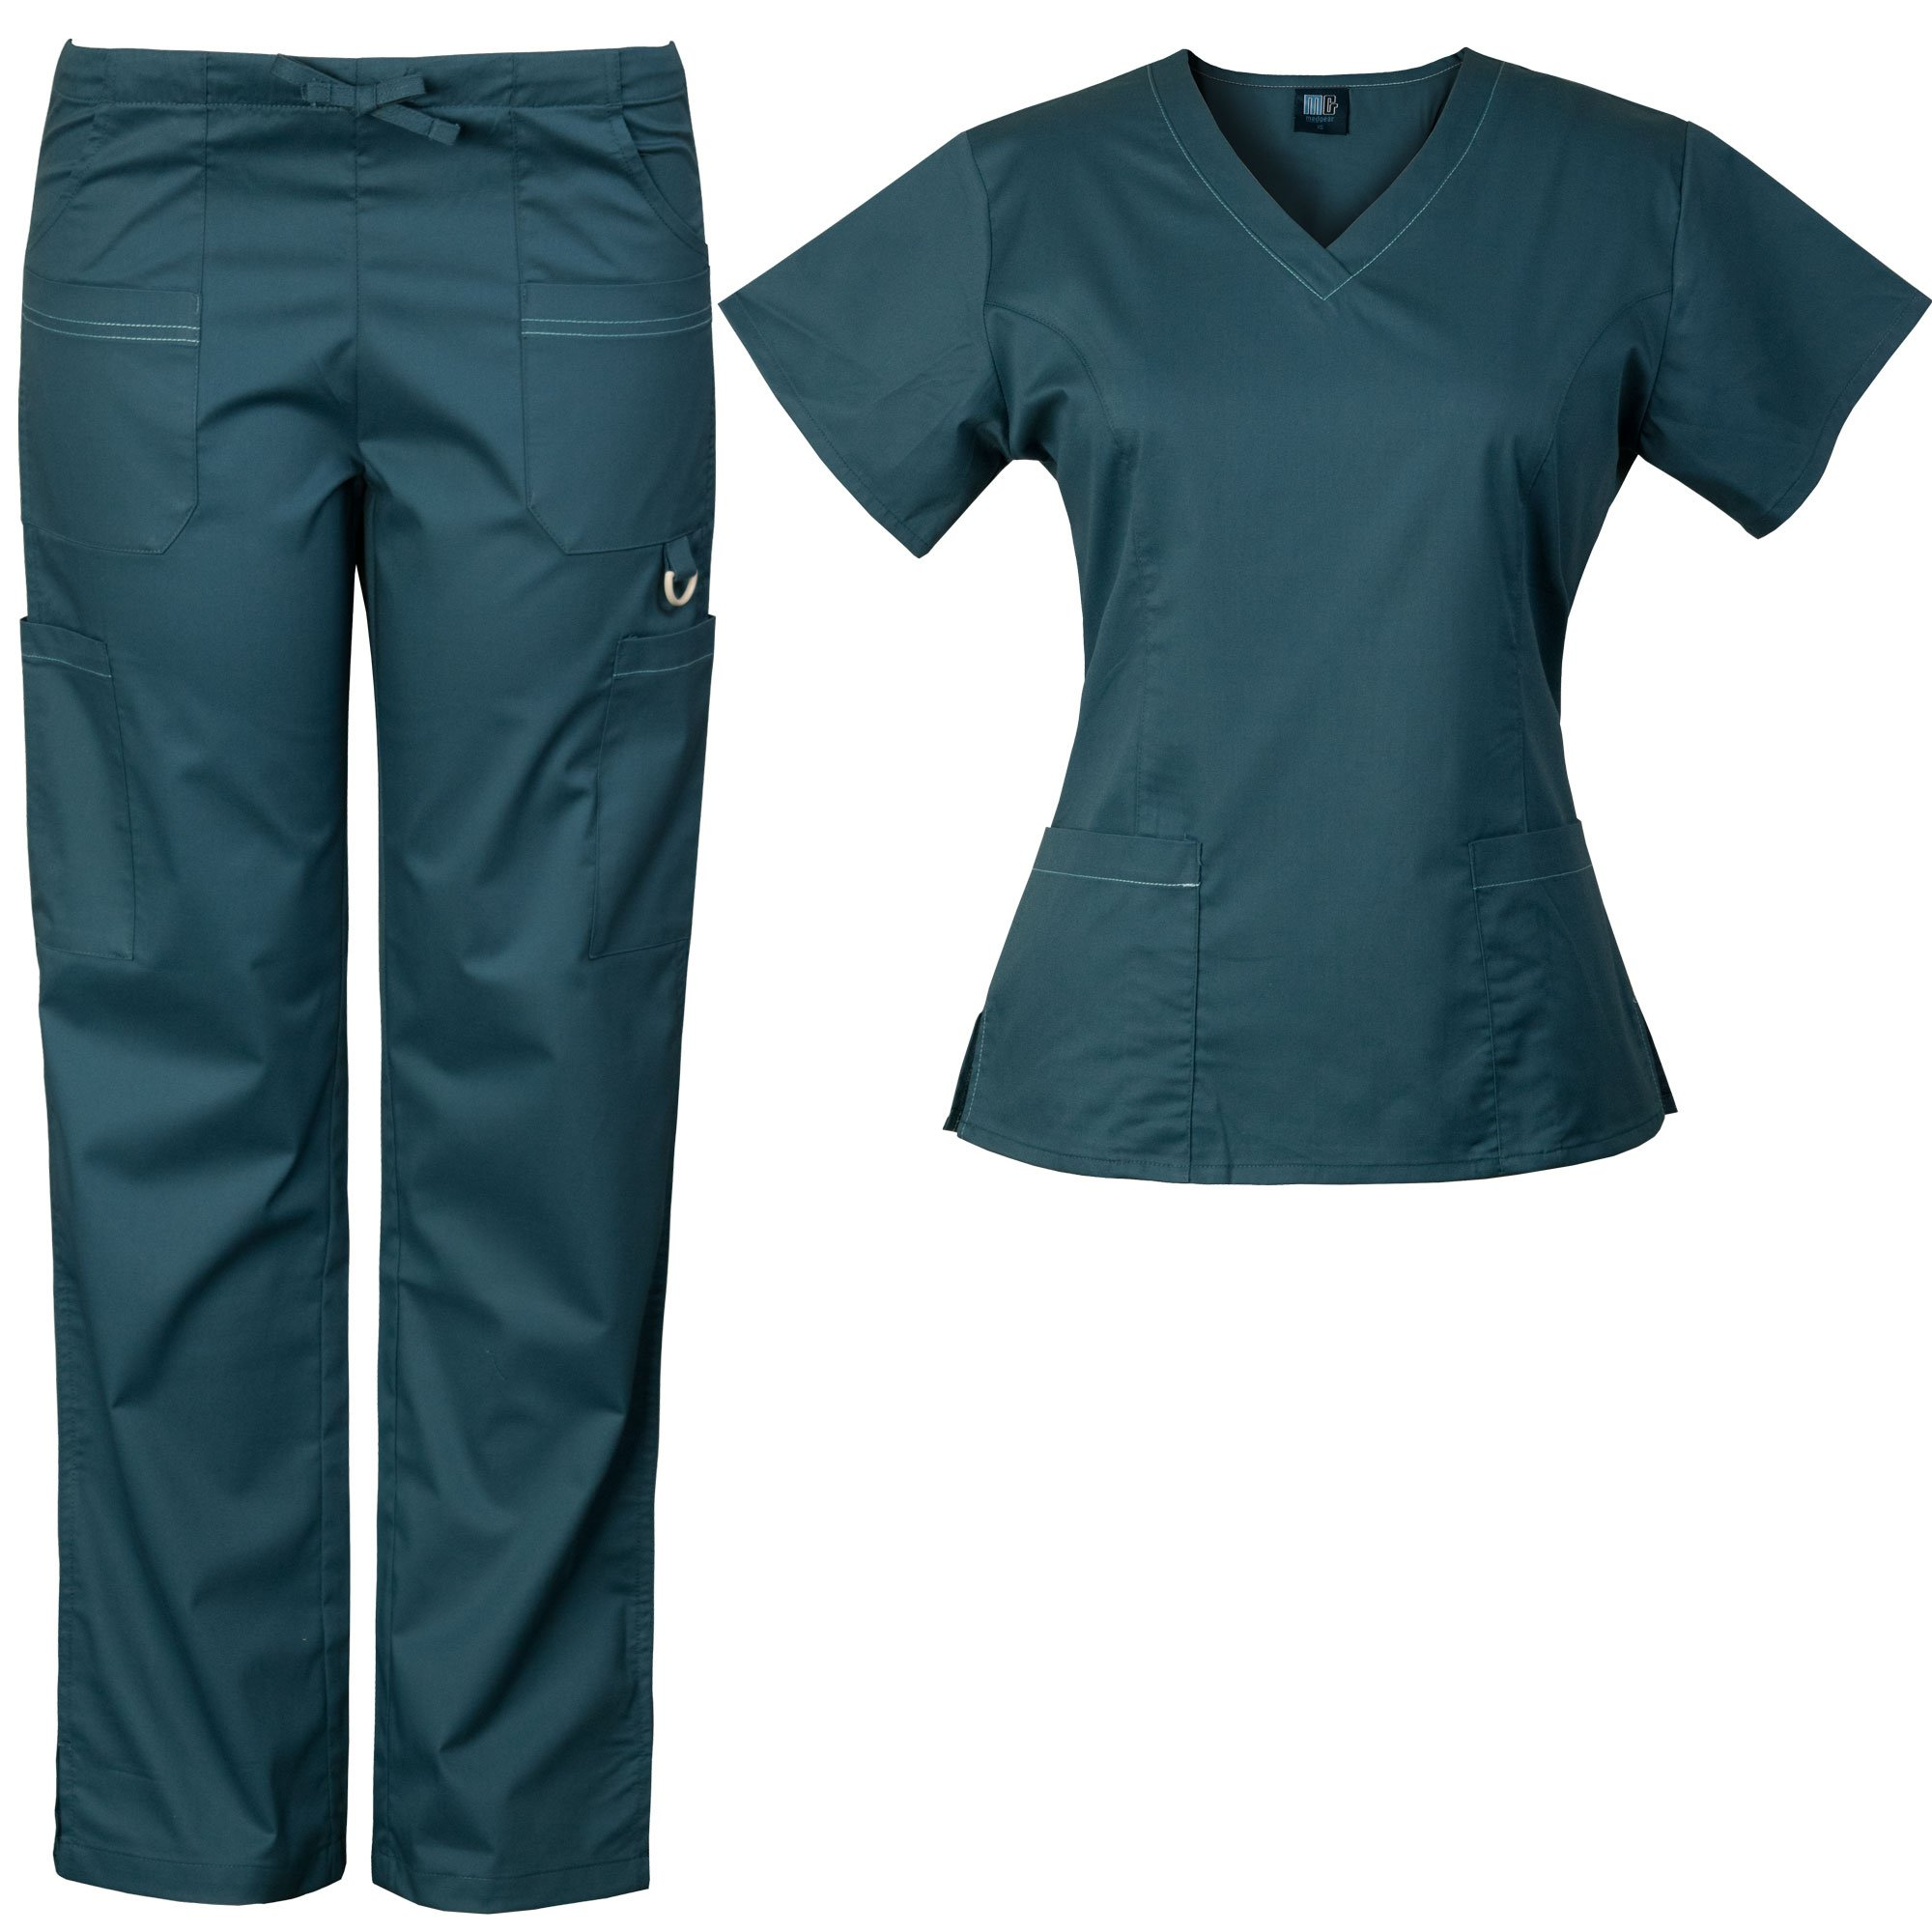 Medgear Women's Solid Scrubs Set Eversoft 2-Way Stretch Fabric 7895ST (L, Carribean)